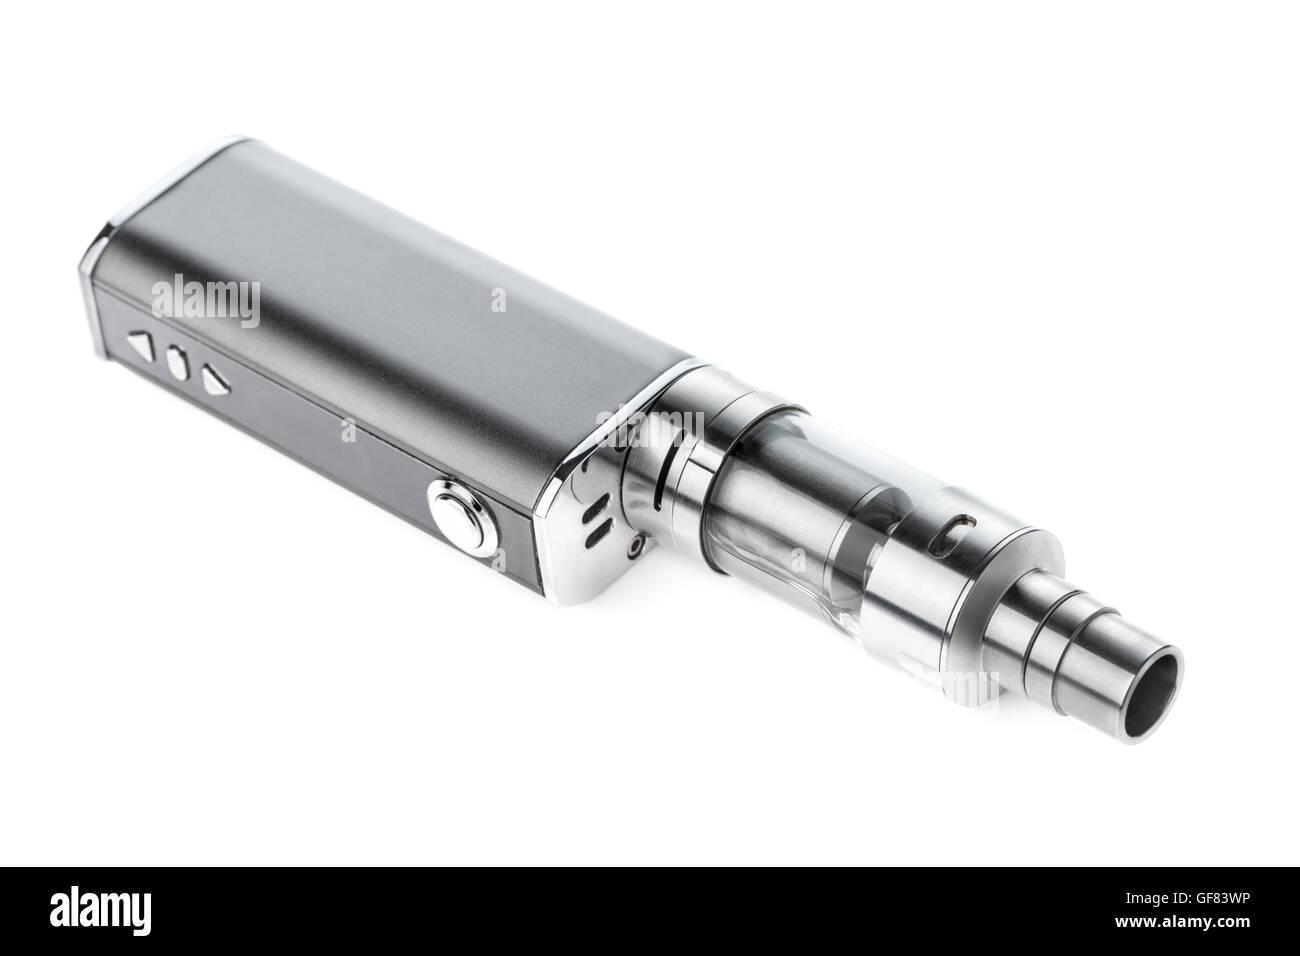 electronic cigarette isolated on white background - Stock Image